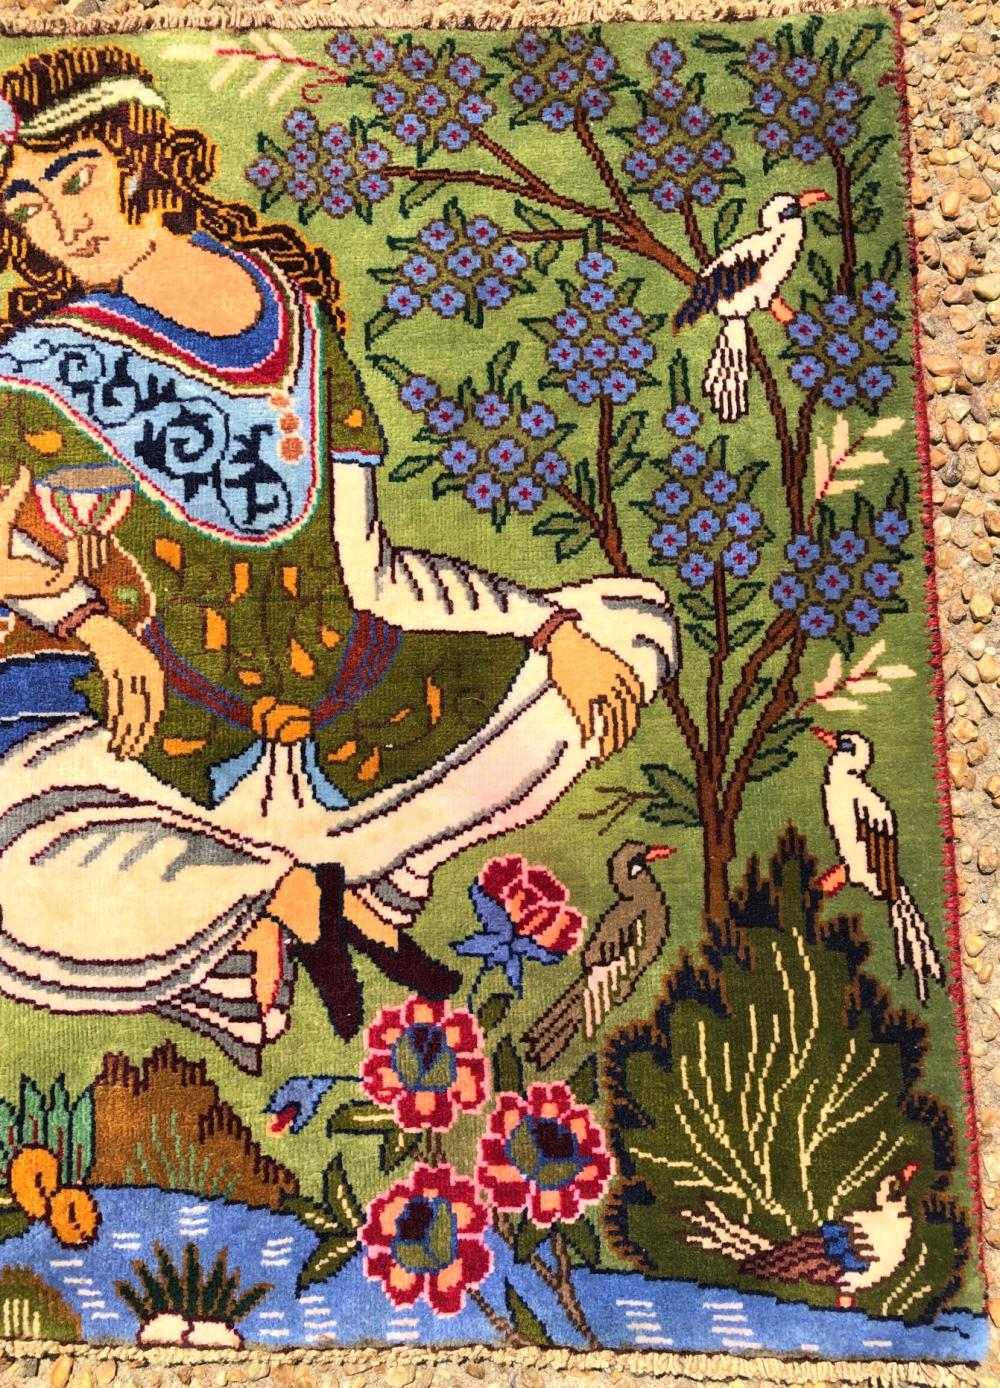 PERSIAN ANTIQUE OMAR KHAYAM PICTORIAL RUG - 2.5 x 3.10